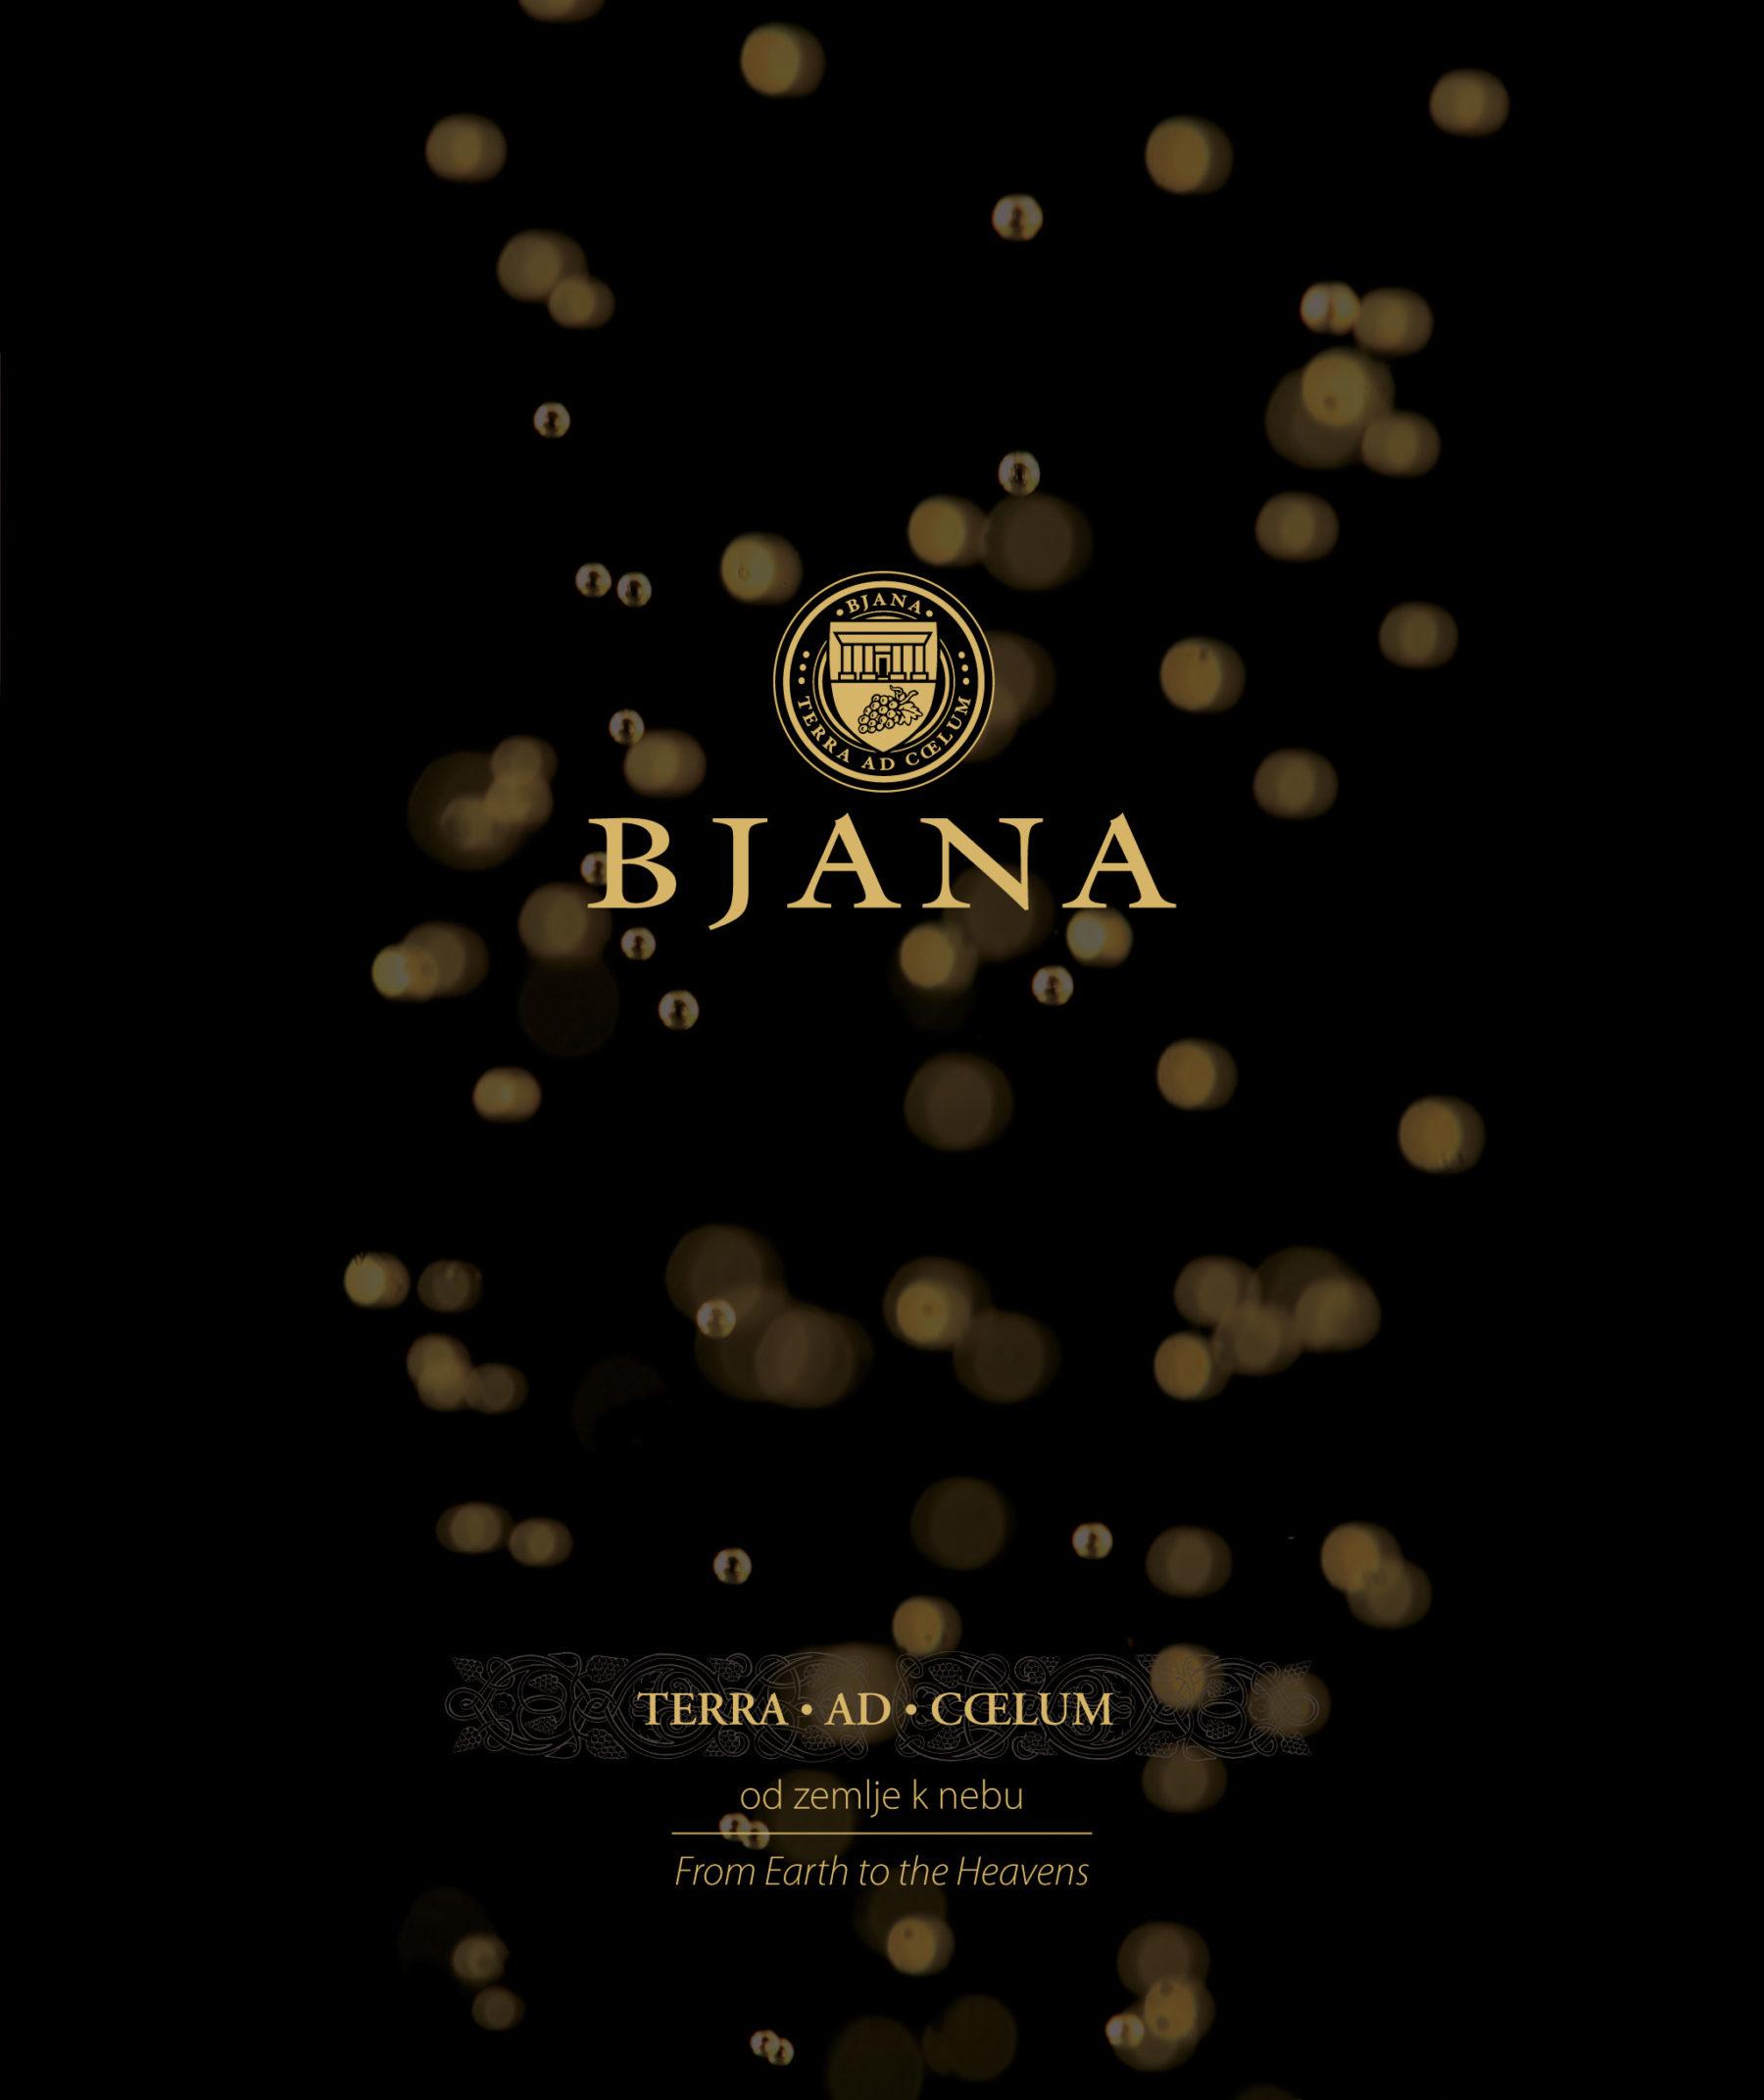 Bjana - zgibanka - naslovnica